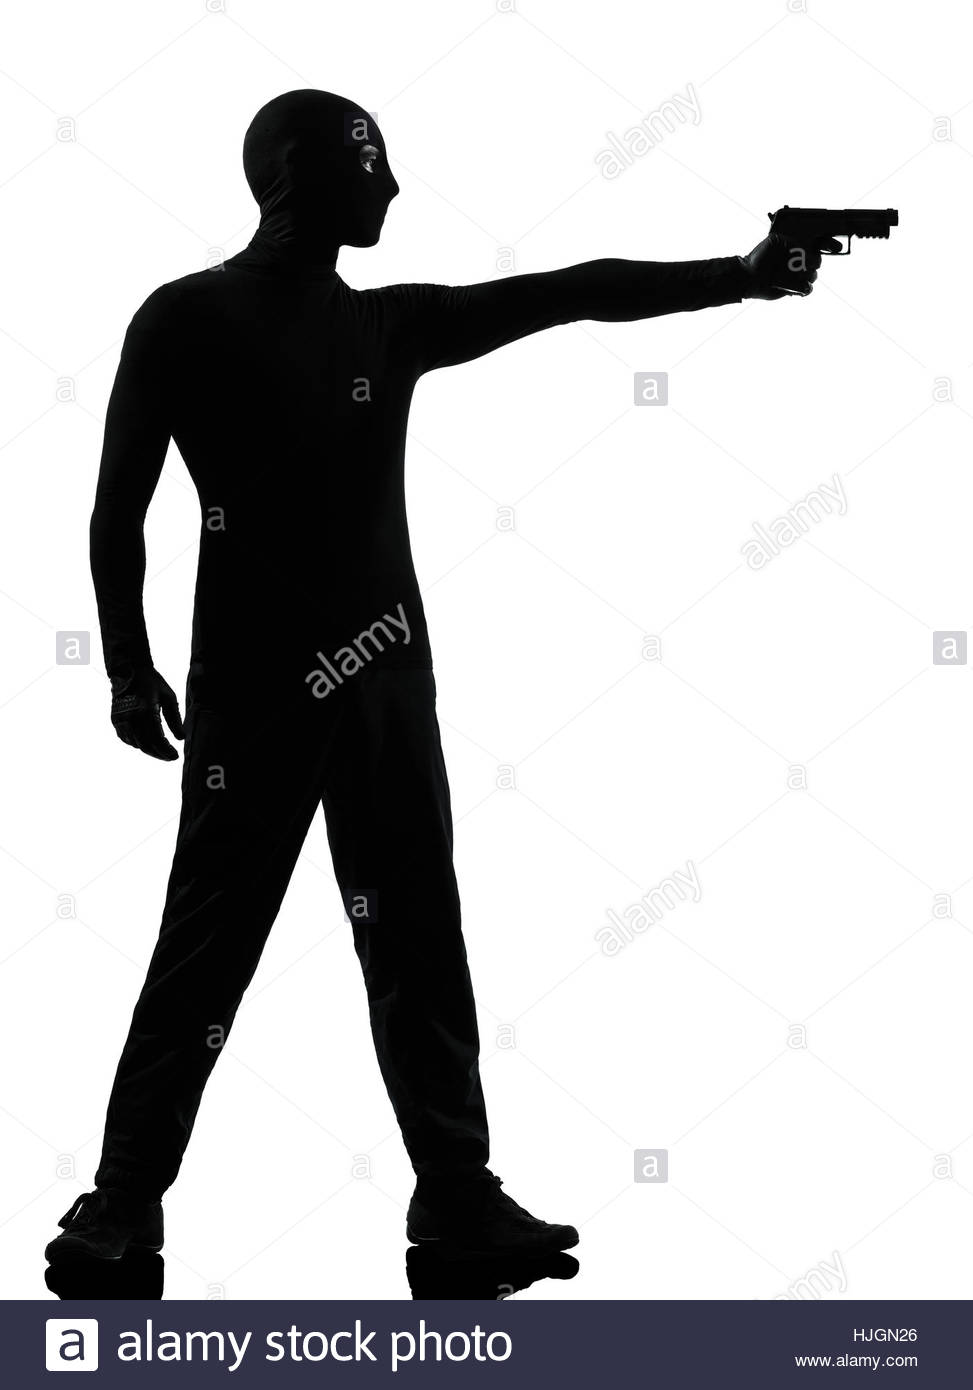 973x1390 Thief Criminal Terrorist Man Aiming Gun In Silhouette Studio